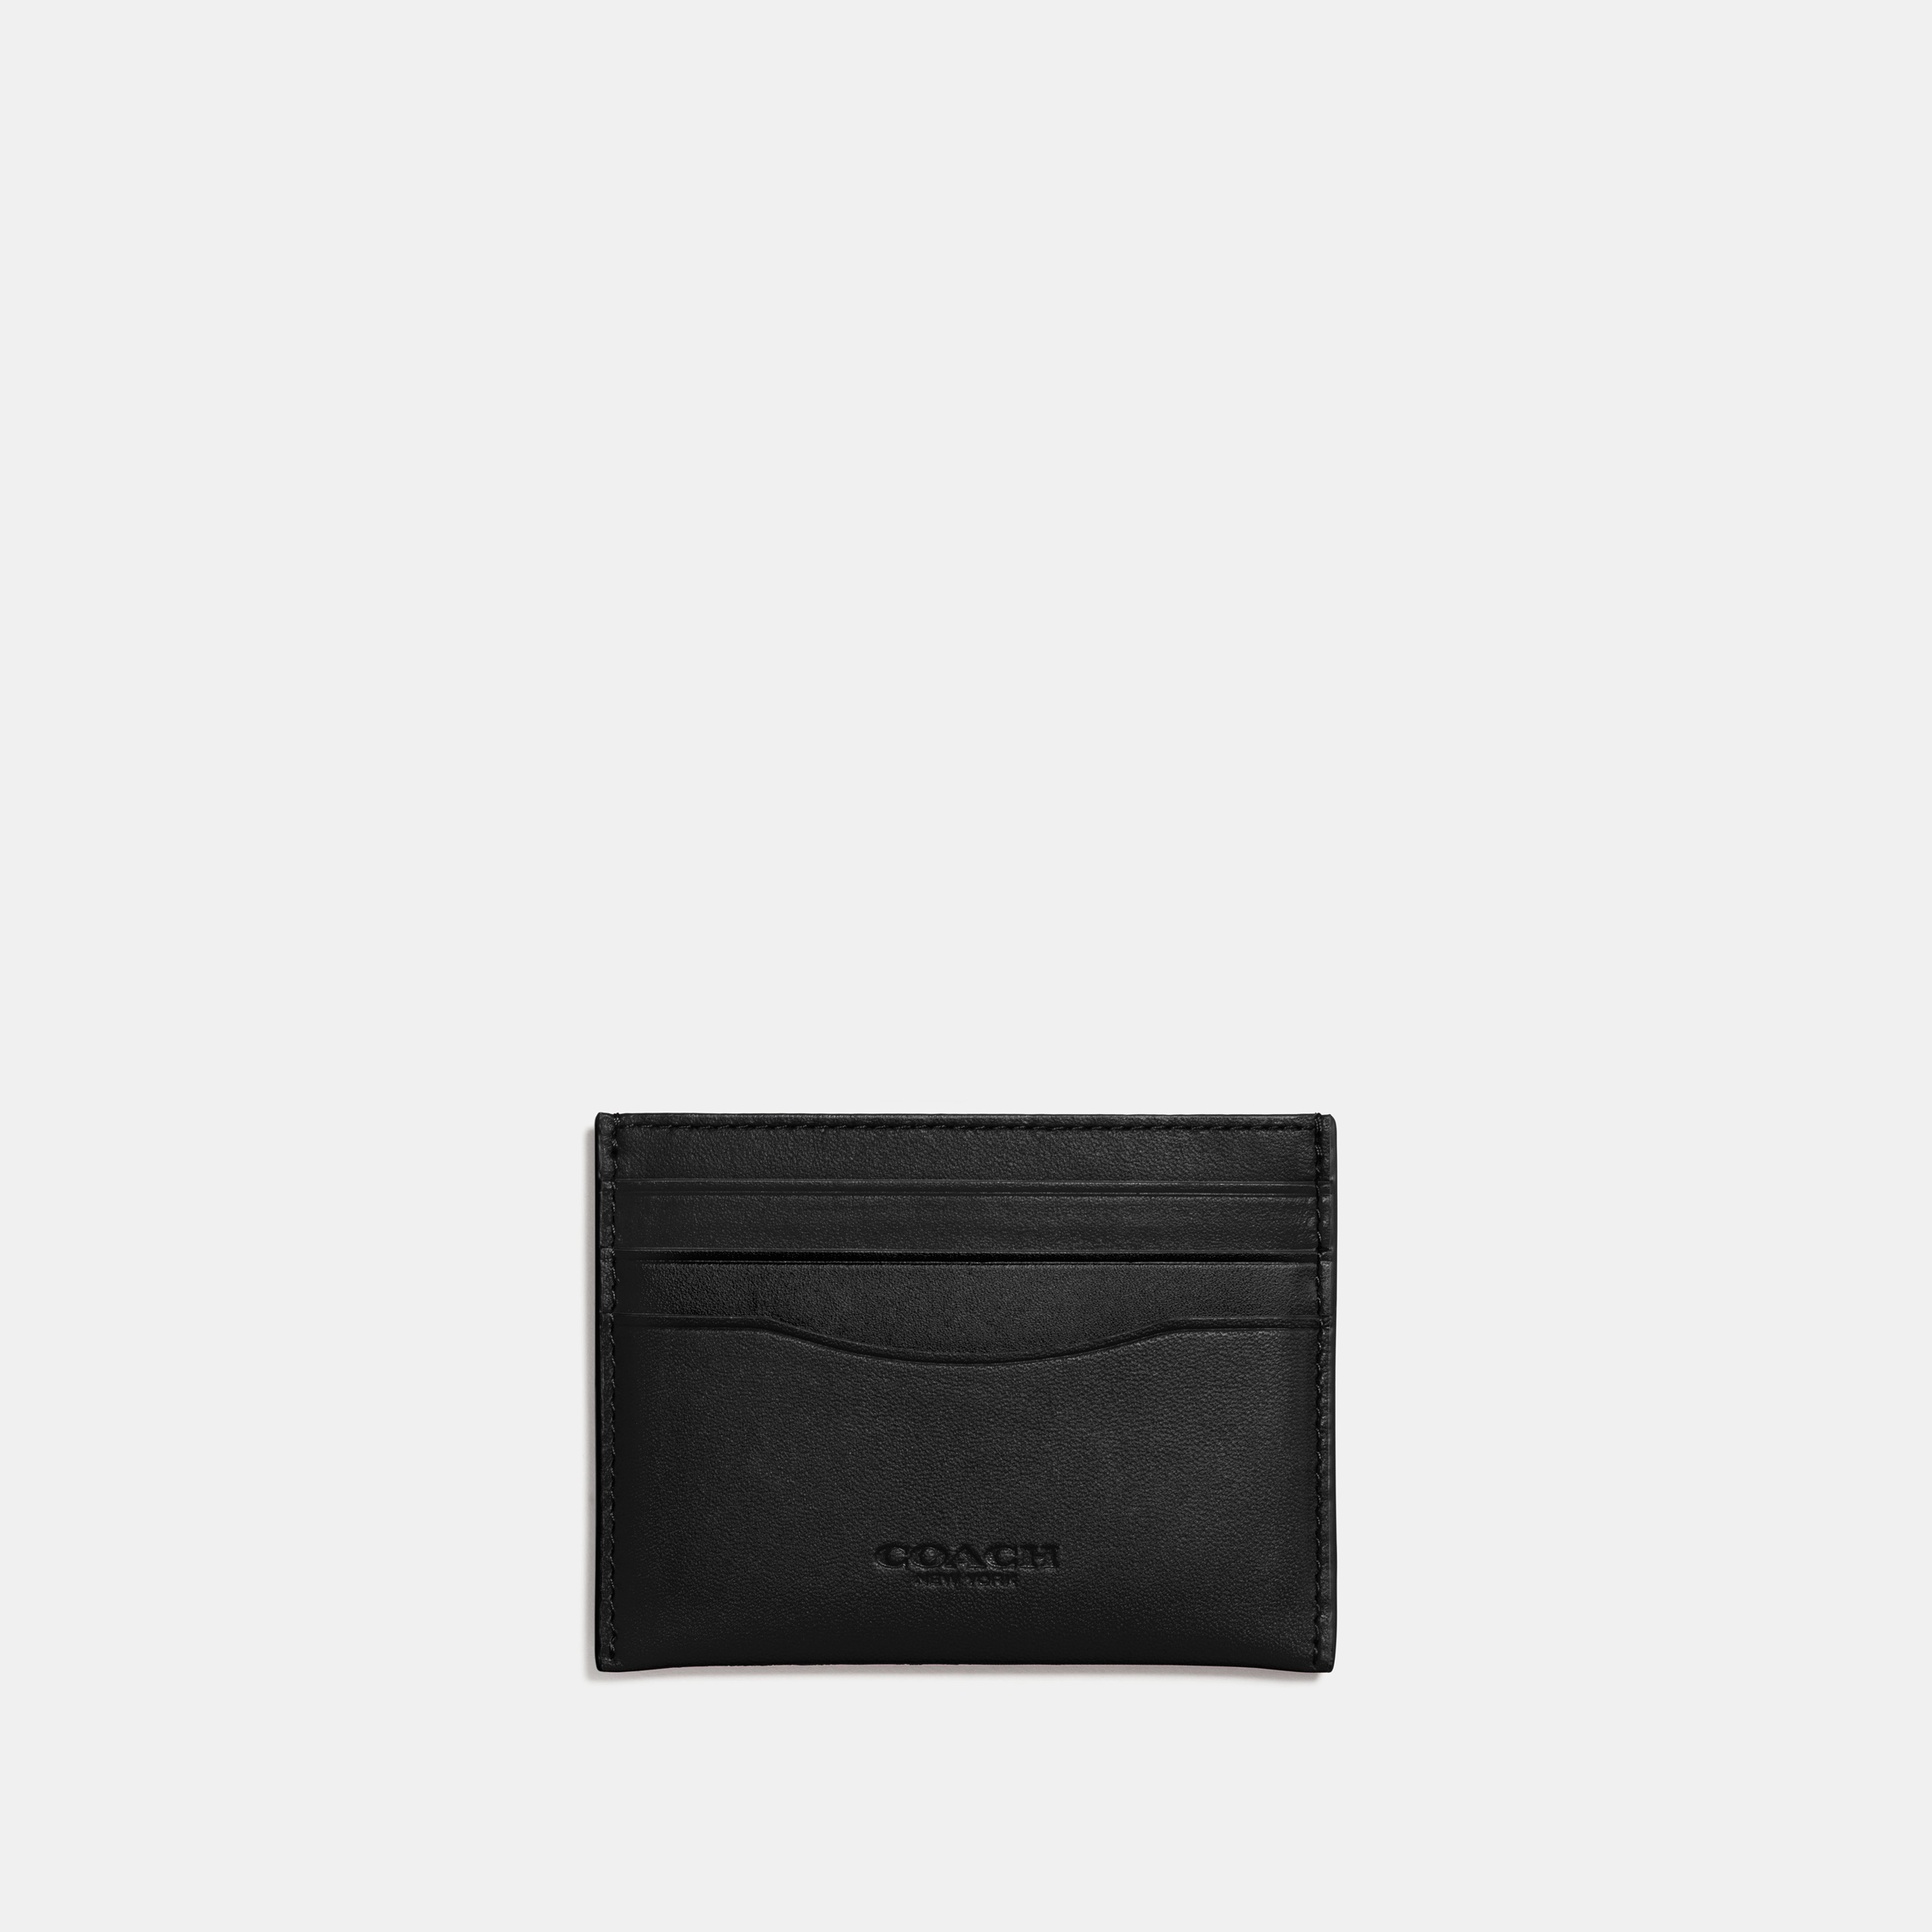 CARD CASE BLACK